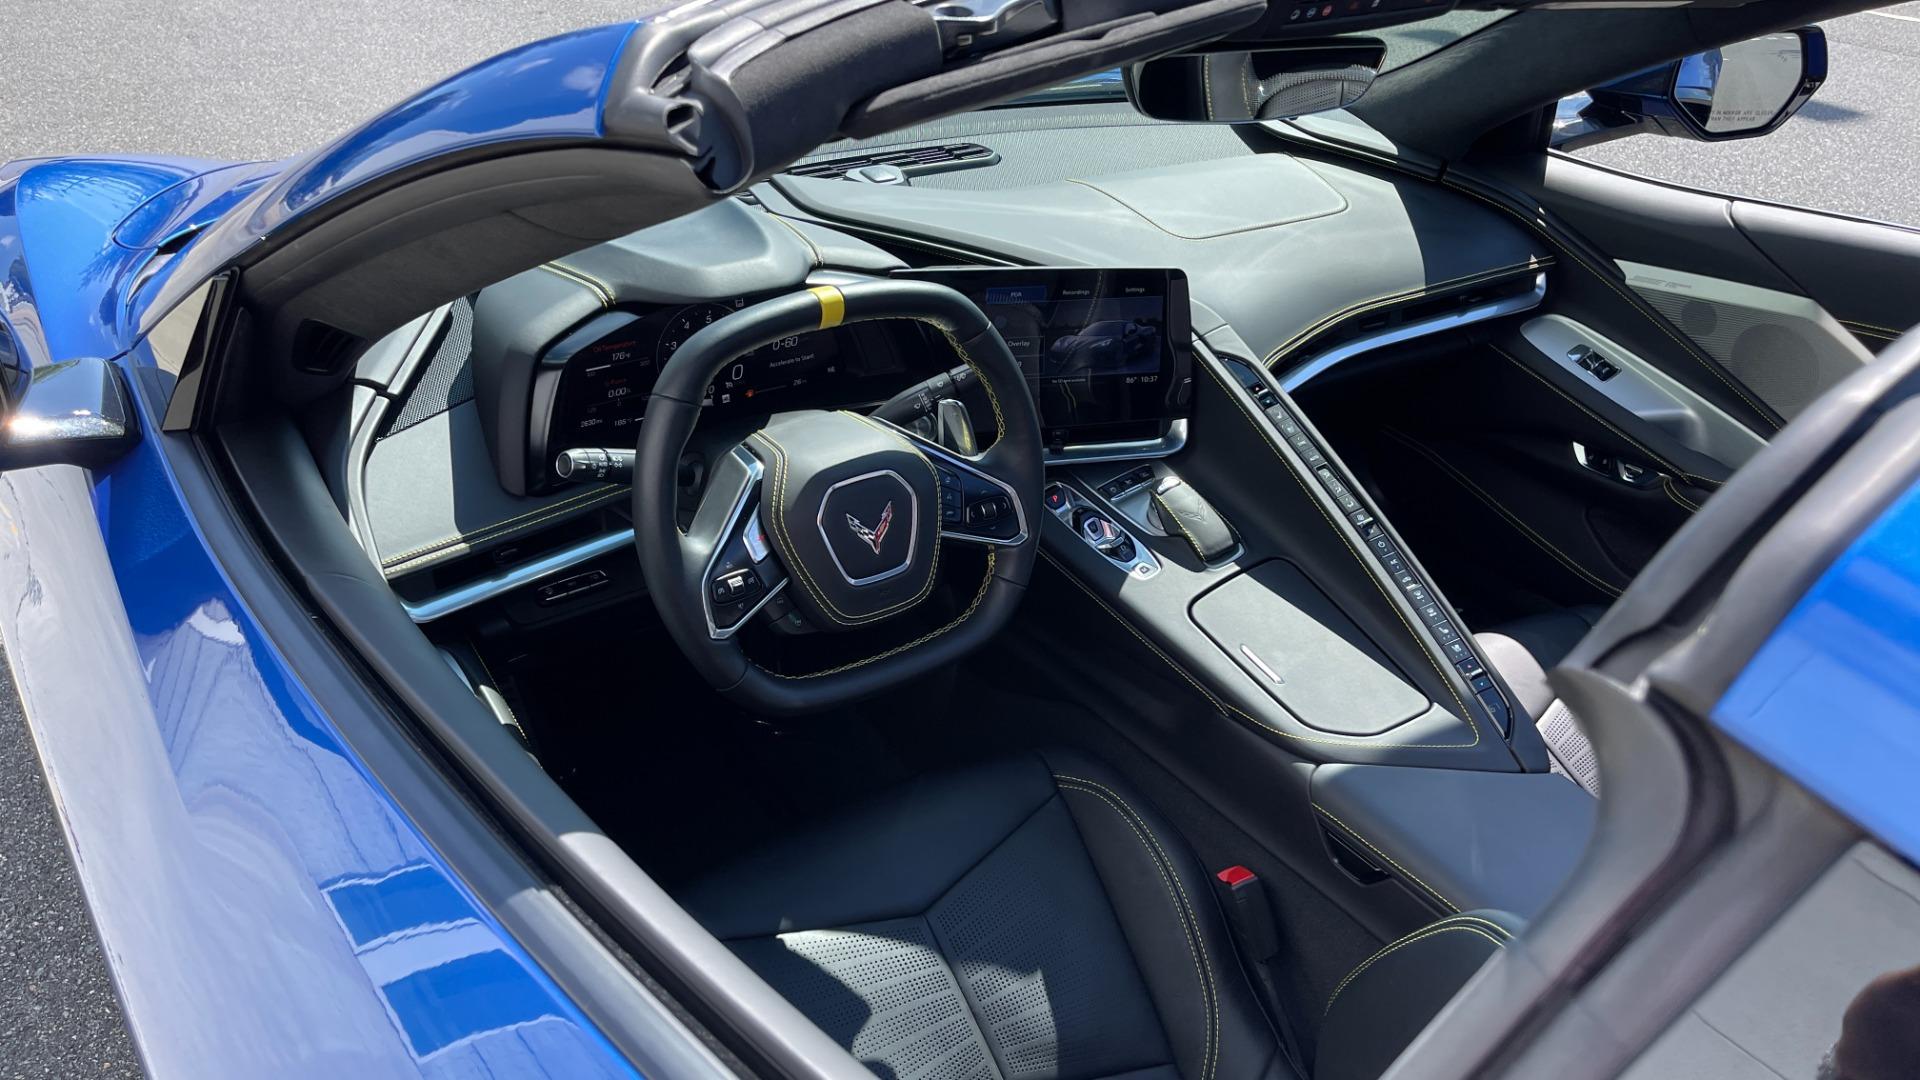 Used 2021 Chevrolet CORVETTE STINGRAY 3LT COUPE / 8-SPD / PERF PKG / NAV / BOSE / REARVIEW for sale $110,995 at Formula Imports in Charlotte NC 28227 47